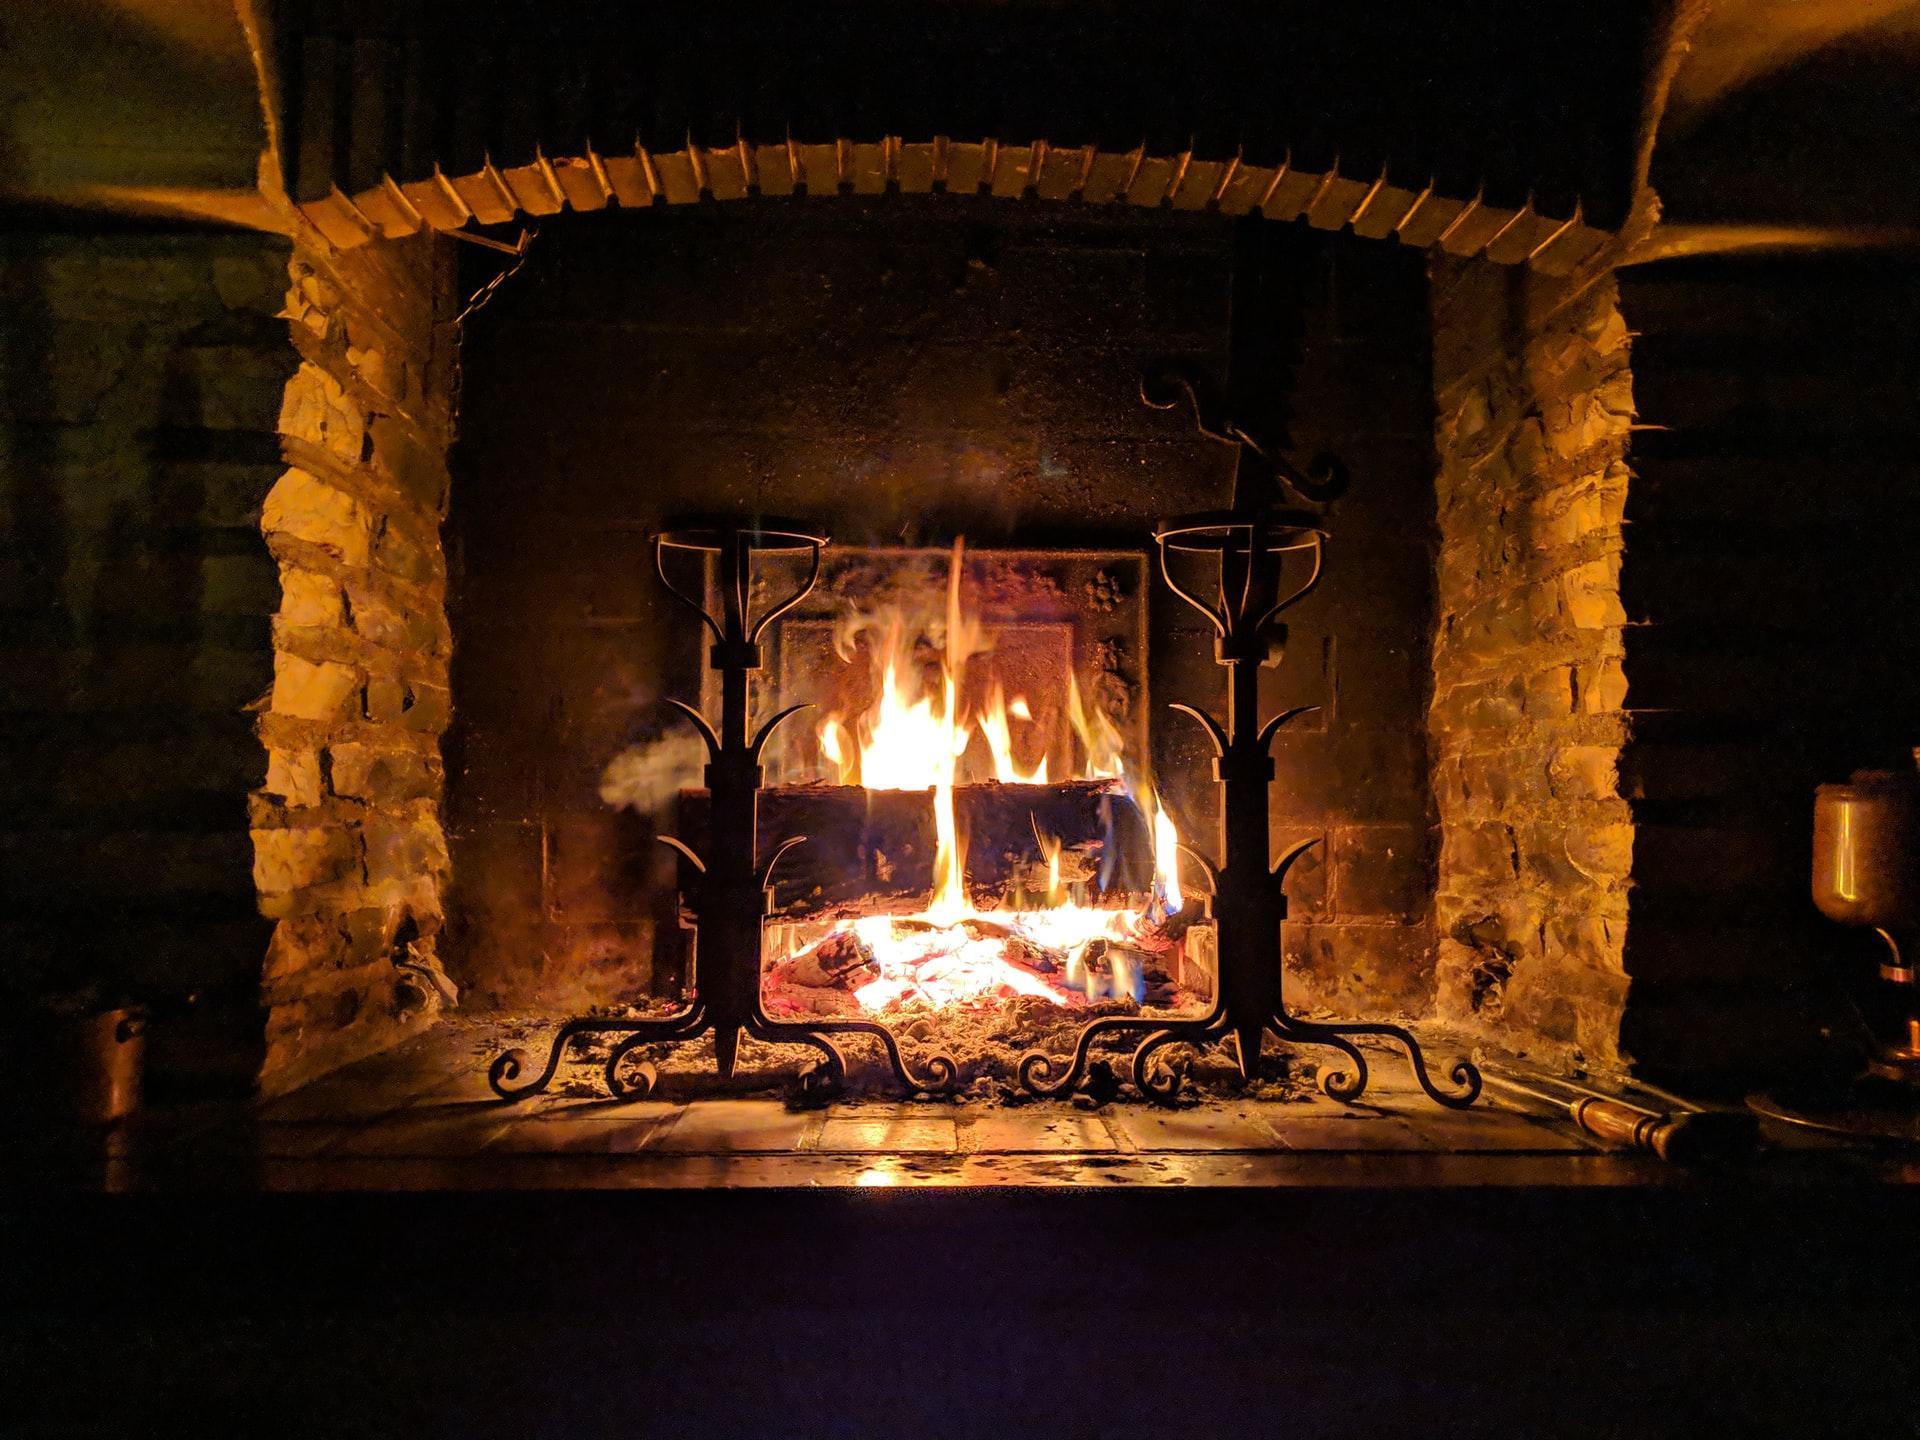 stephane juban DI8Bf6K1134 unsplash - Hold varmen med en miljøvenlig varmekilde